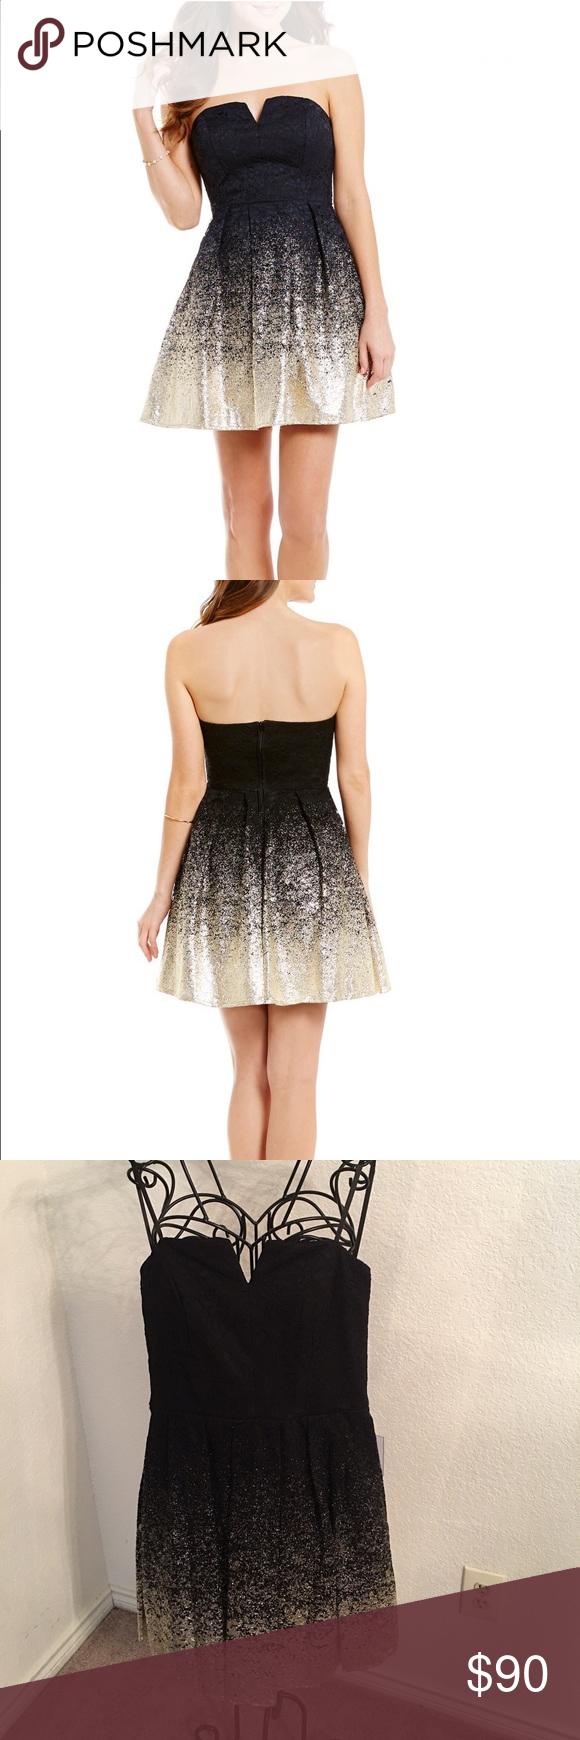 B darlin strapless black partyprom dress nwt pinterest black